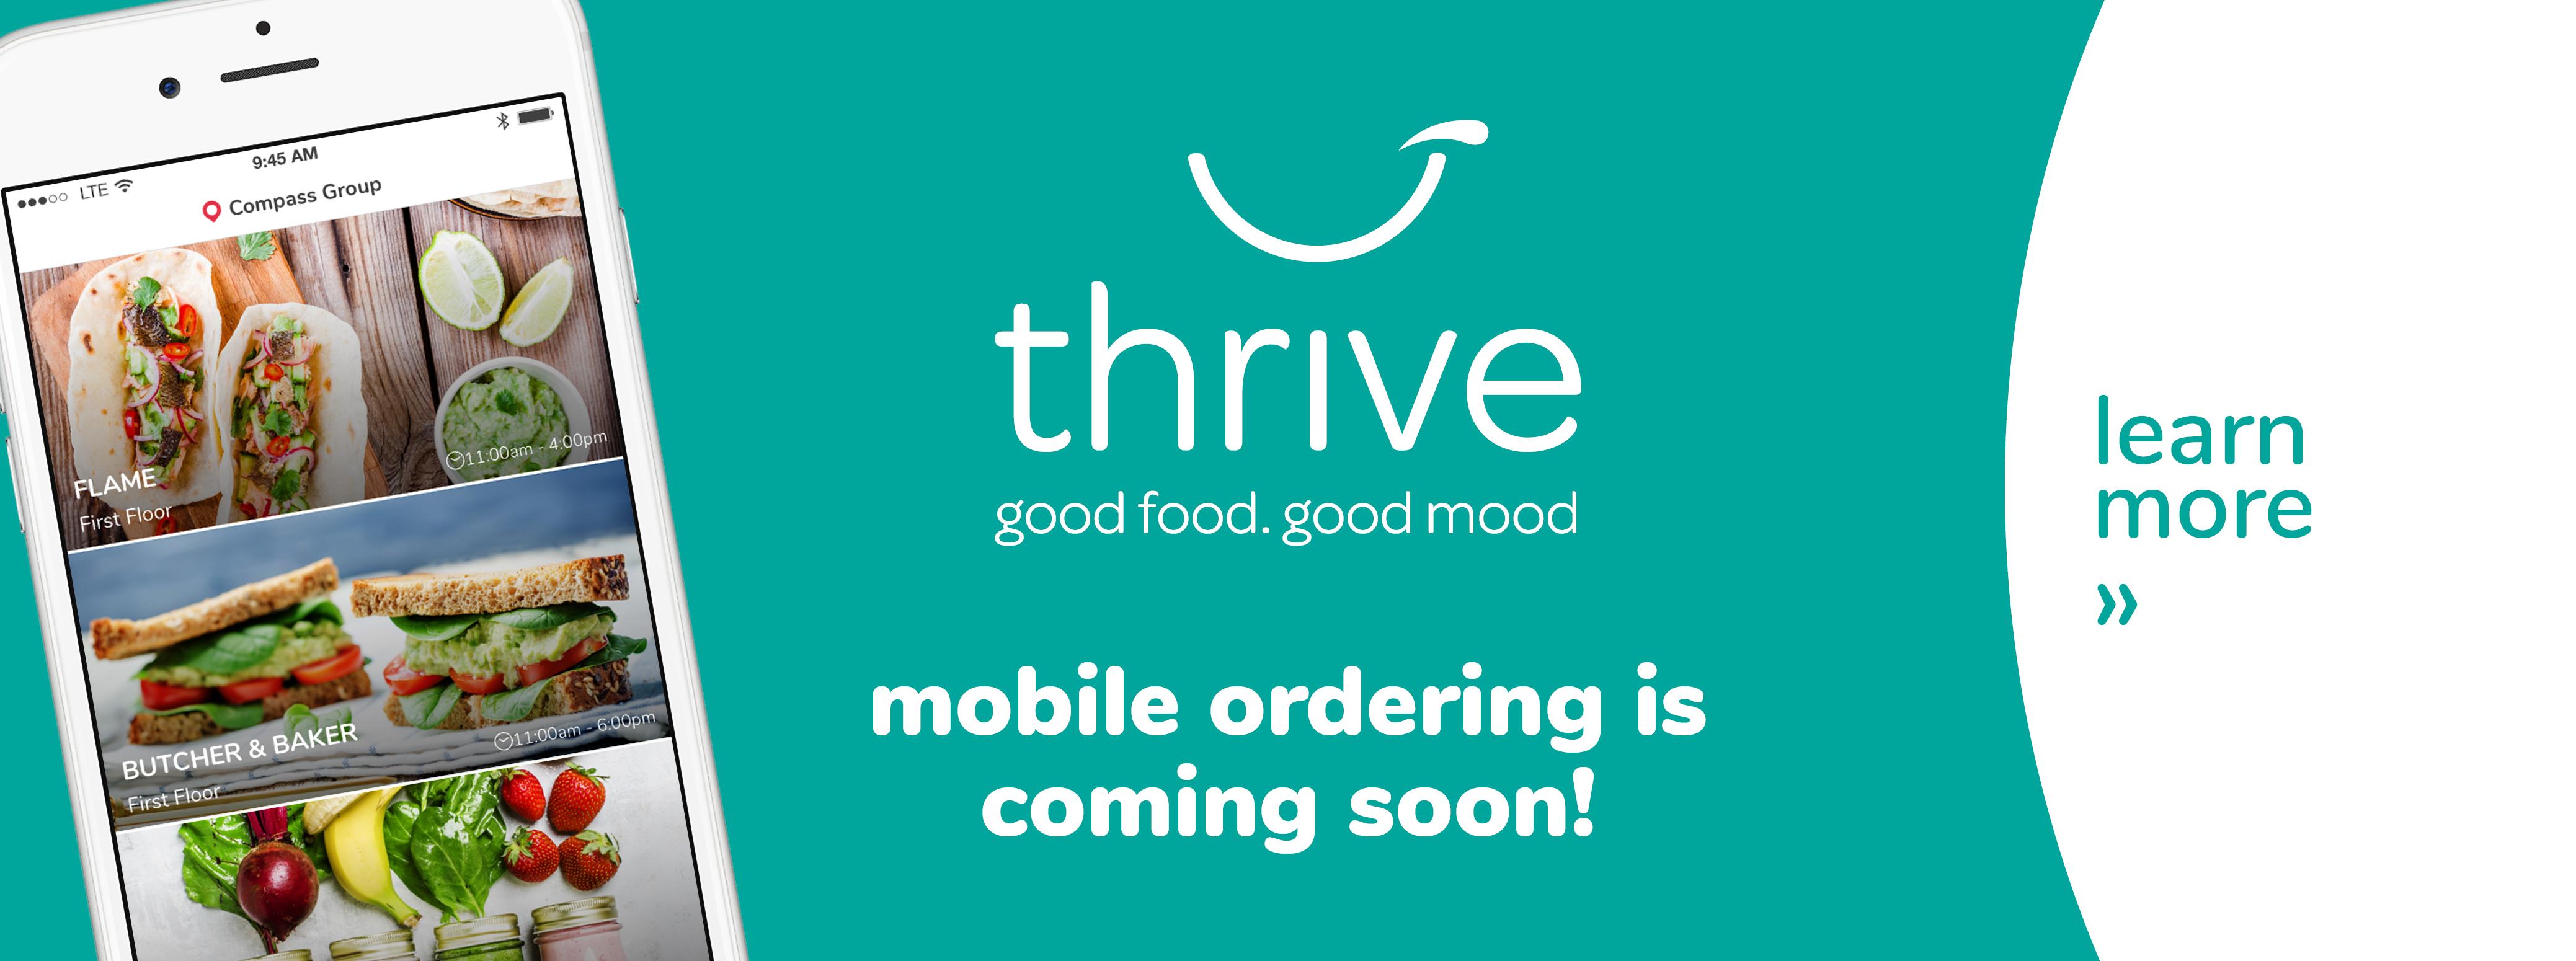 Thrive image